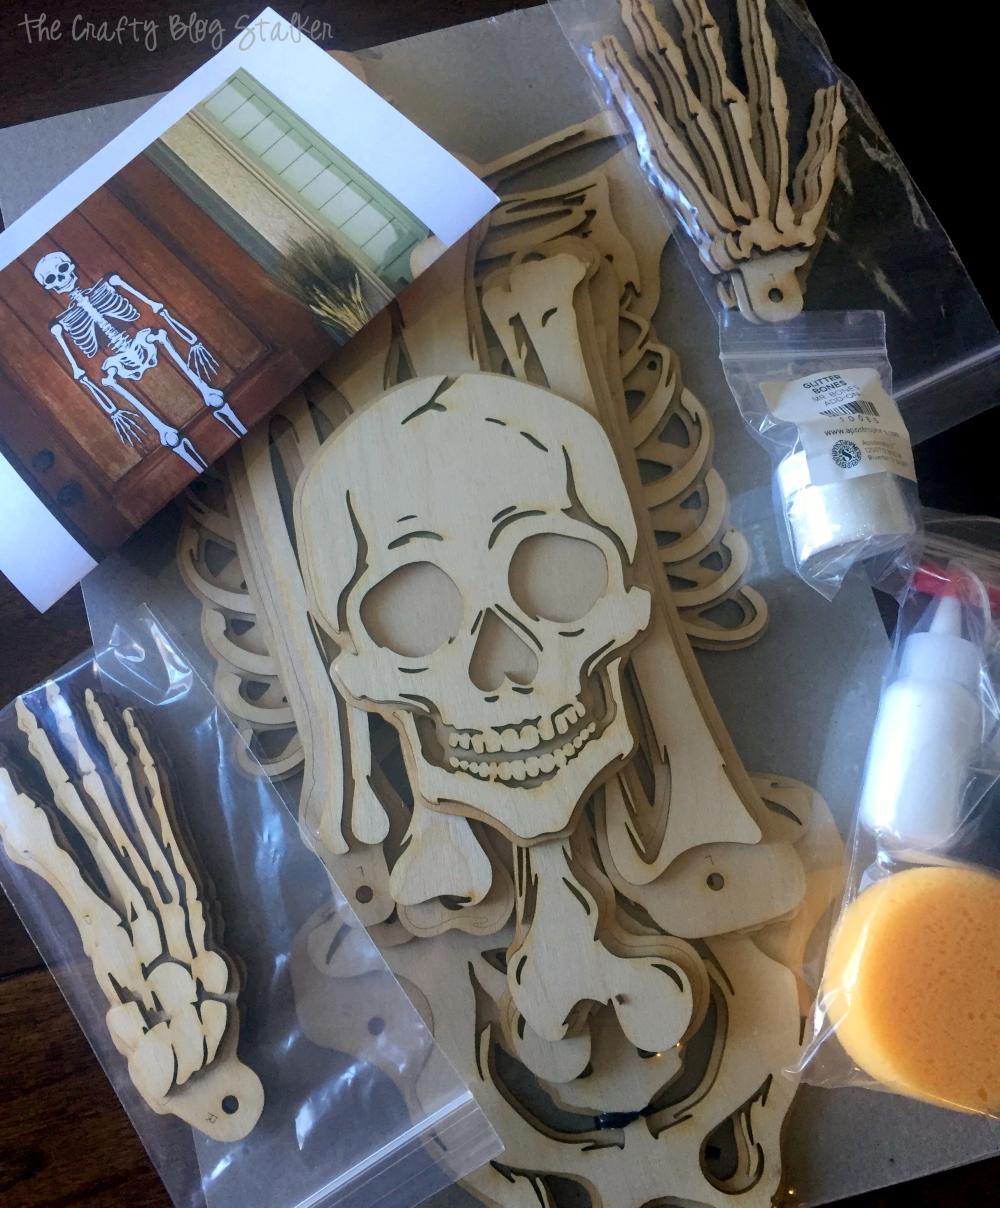 Mr. Bones | Craft Kit | Halloween | Skeleton | Laser Cut Wood | Home Decor